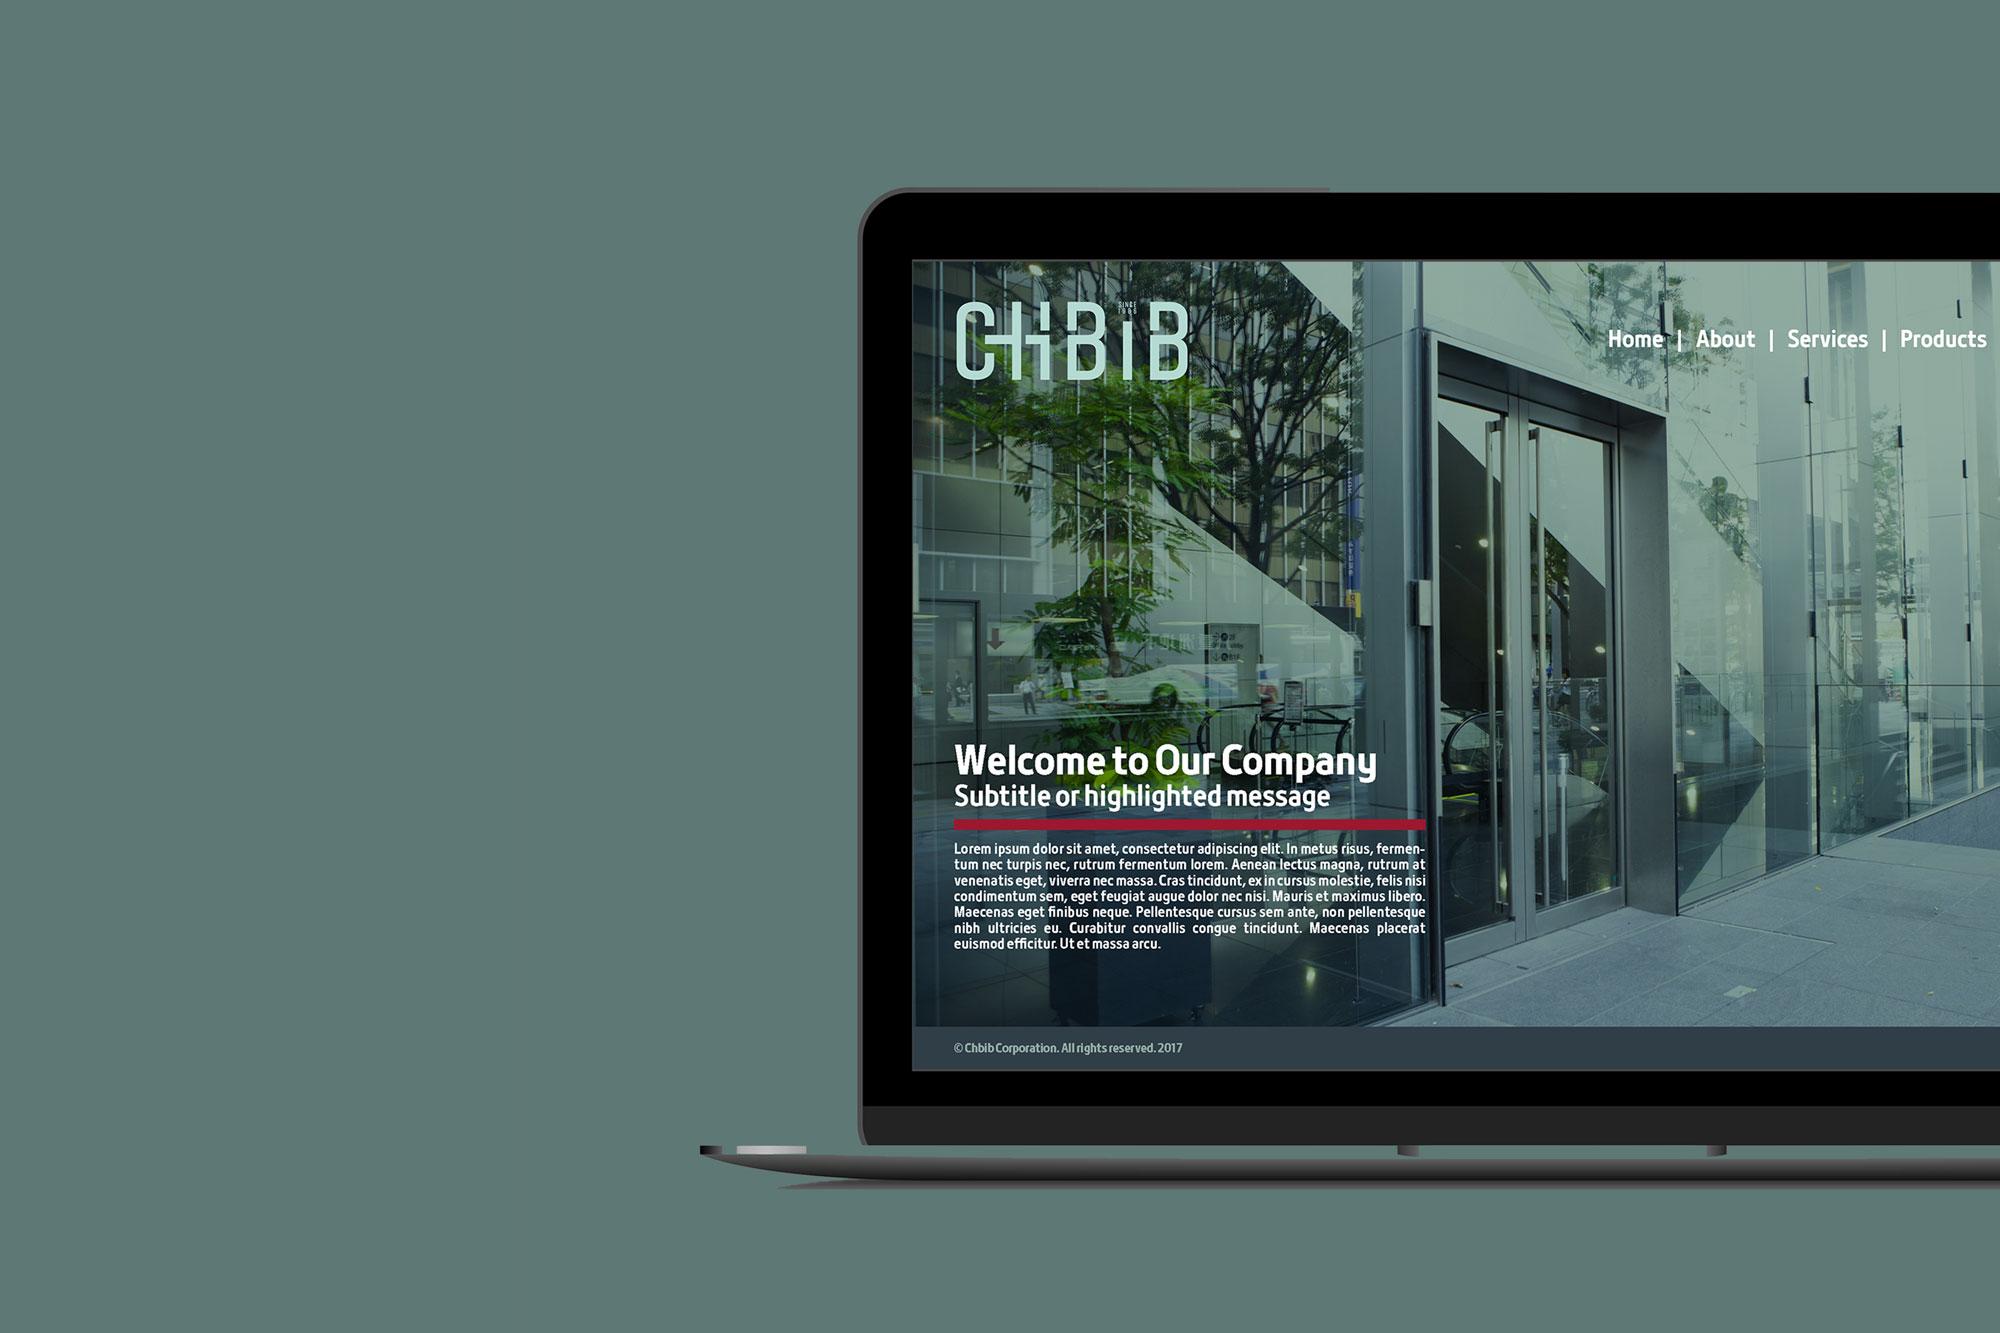 Chbib-Web-01